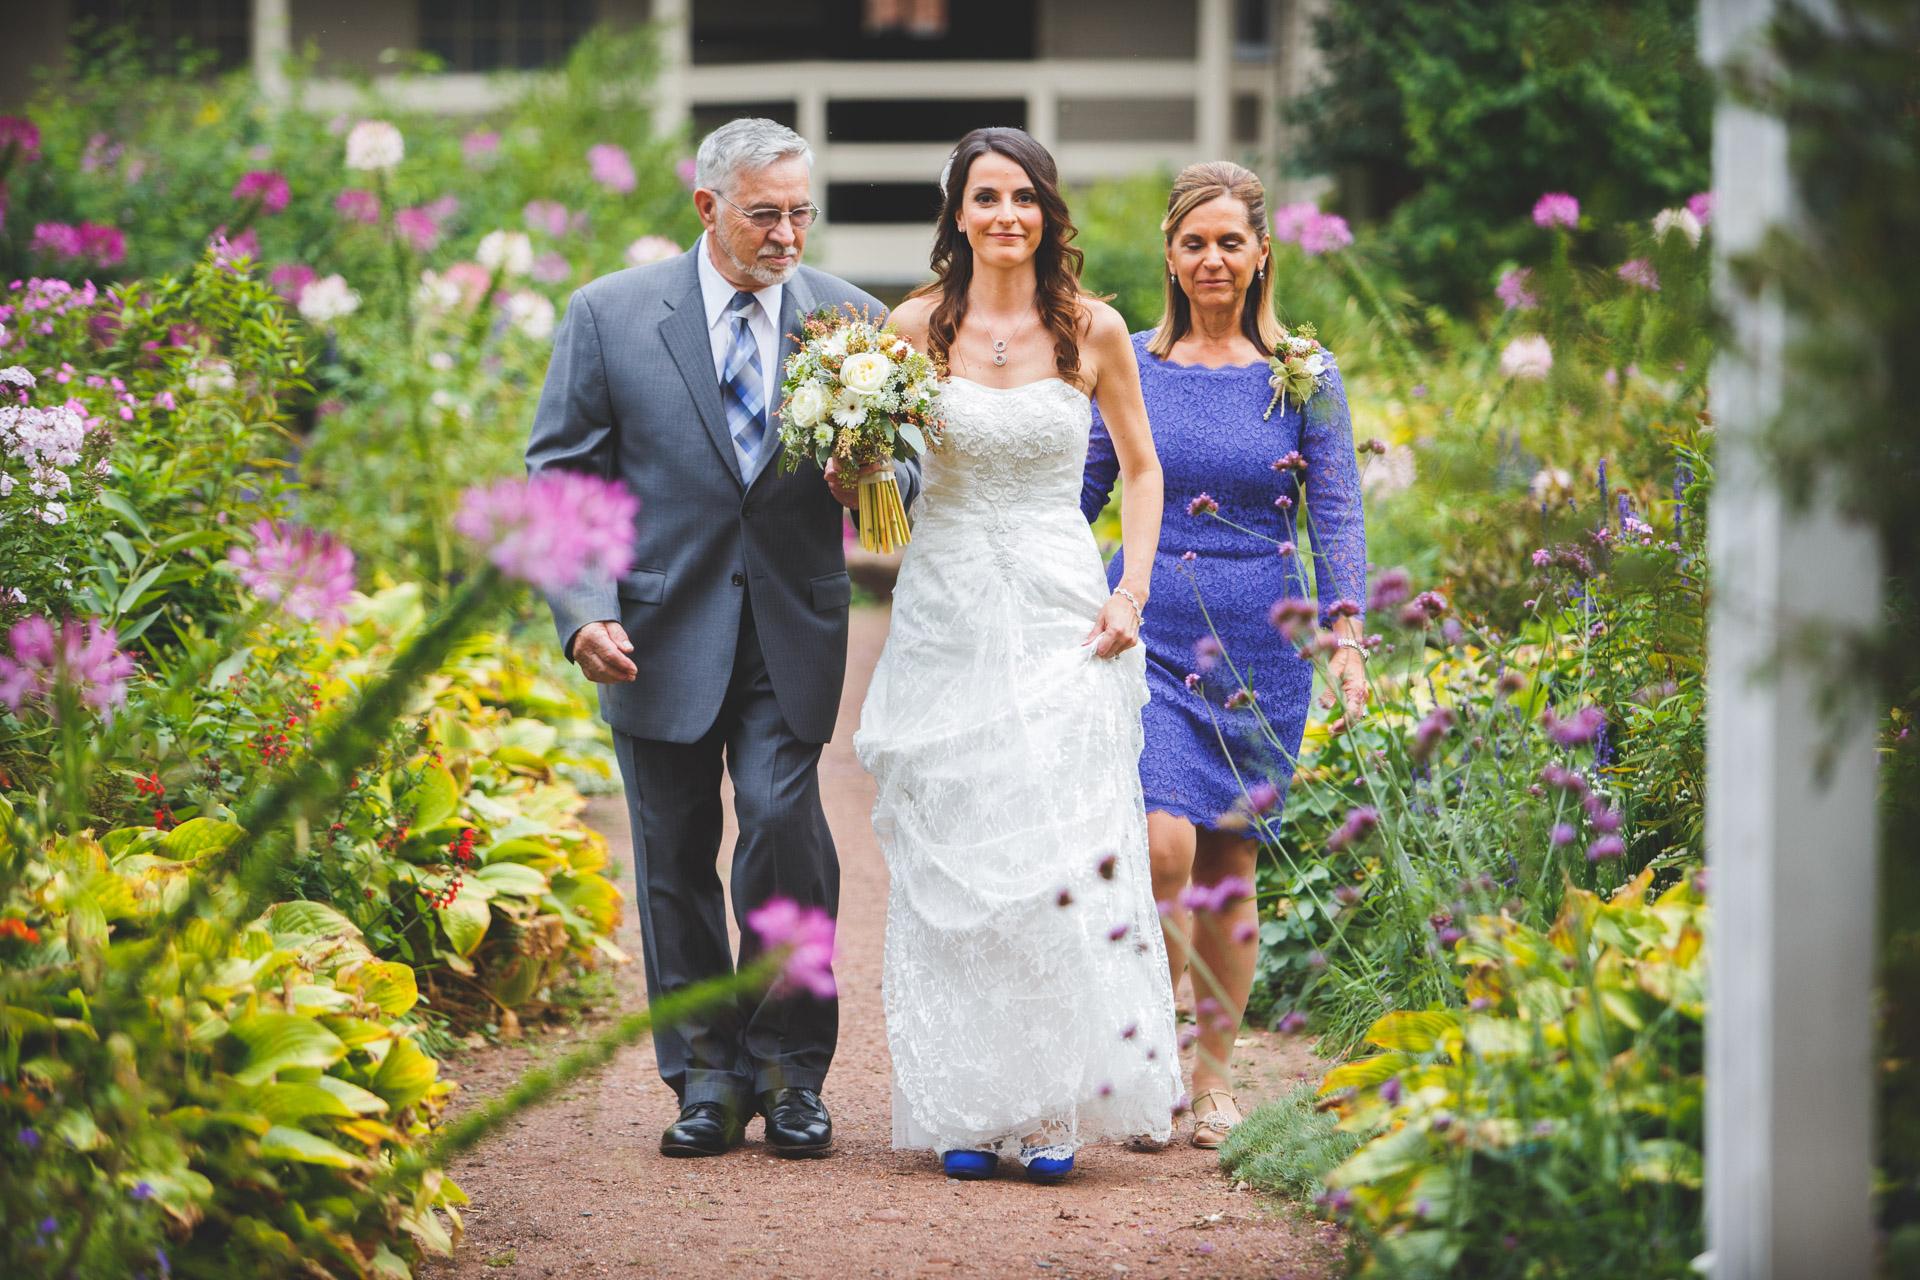 Wedding Photos at Webb Barn Wethersfield -15.jpg